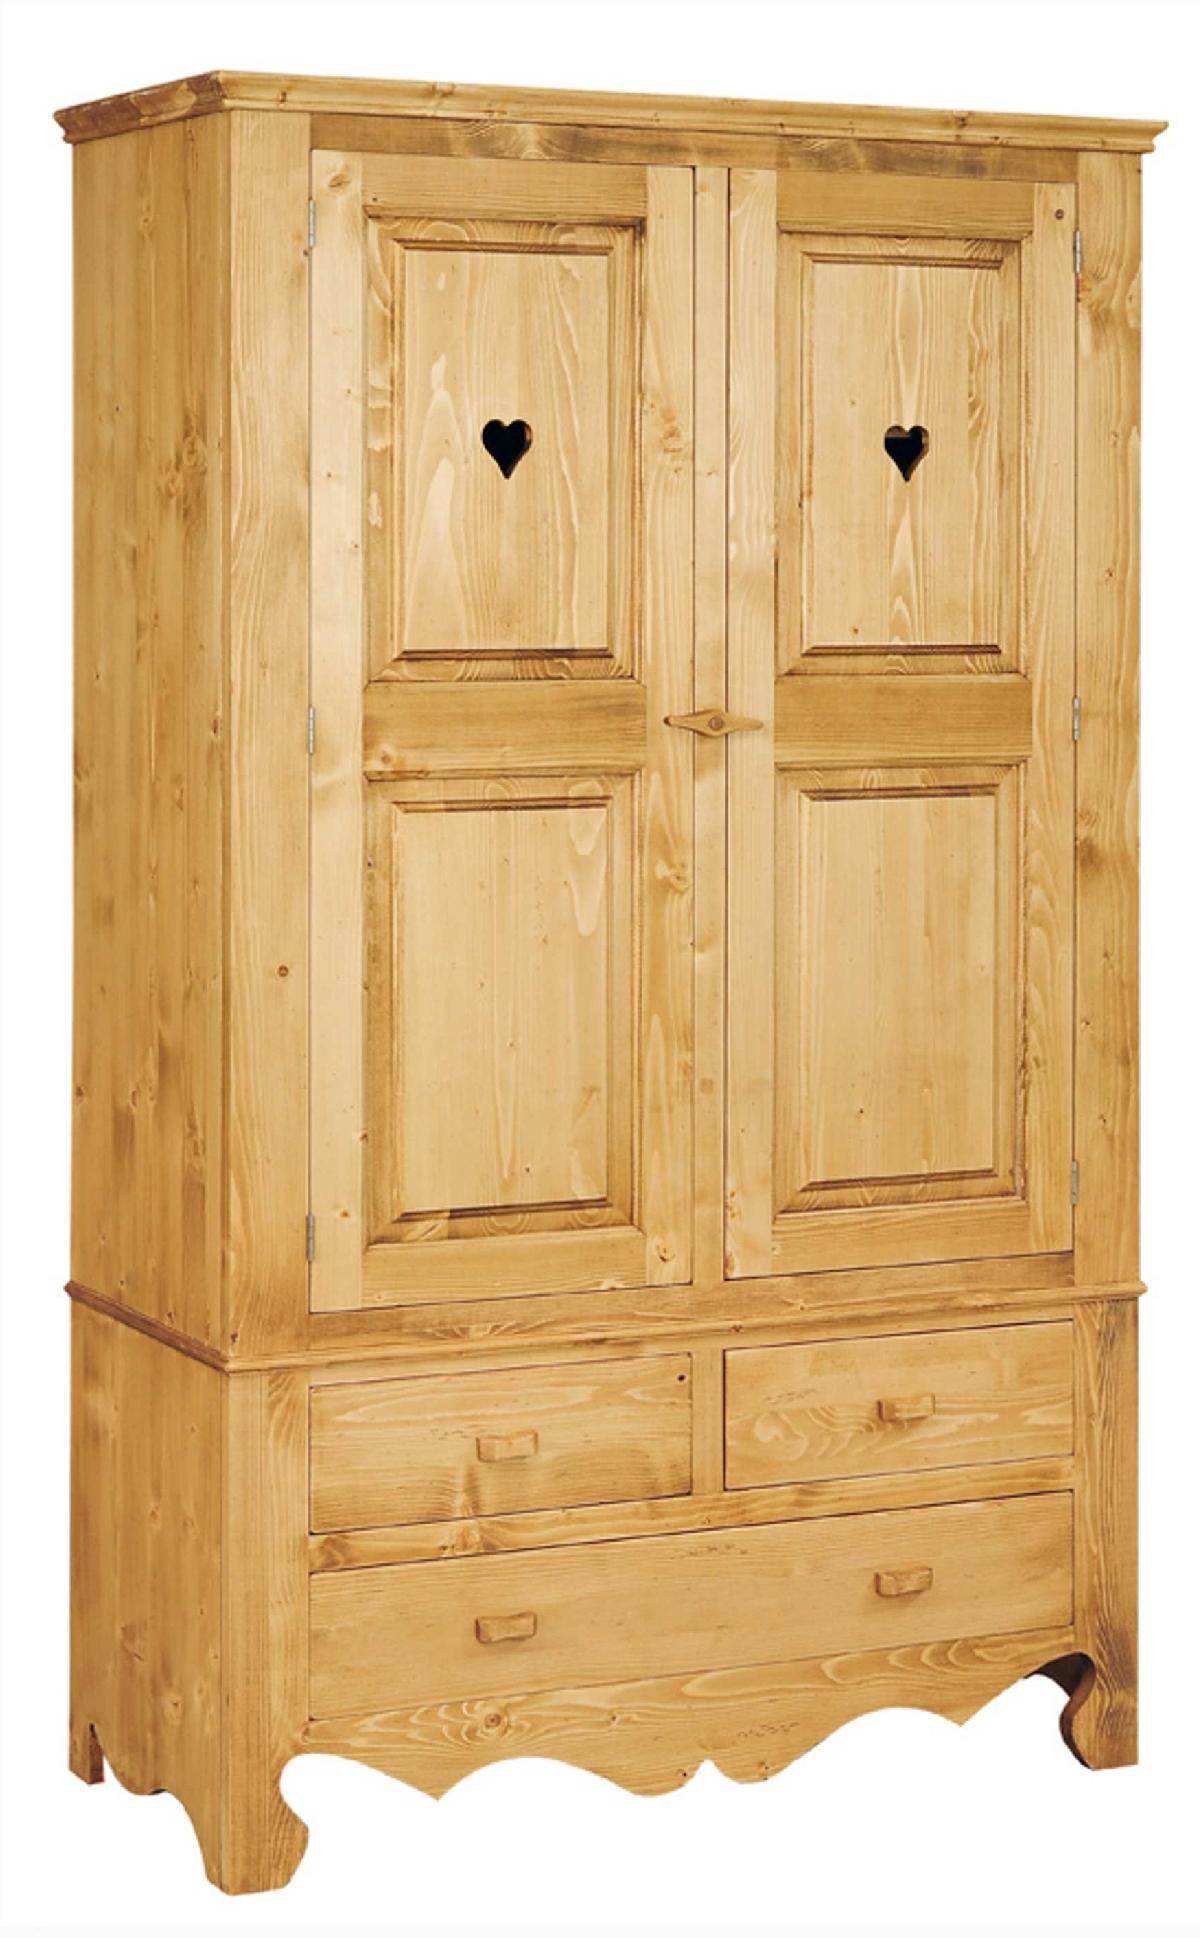 armoire en pin massif 2 portes 2 tiroirs chamonix le magasin du pin. Black Bedroom Furniture Sets. Home Design Ideas